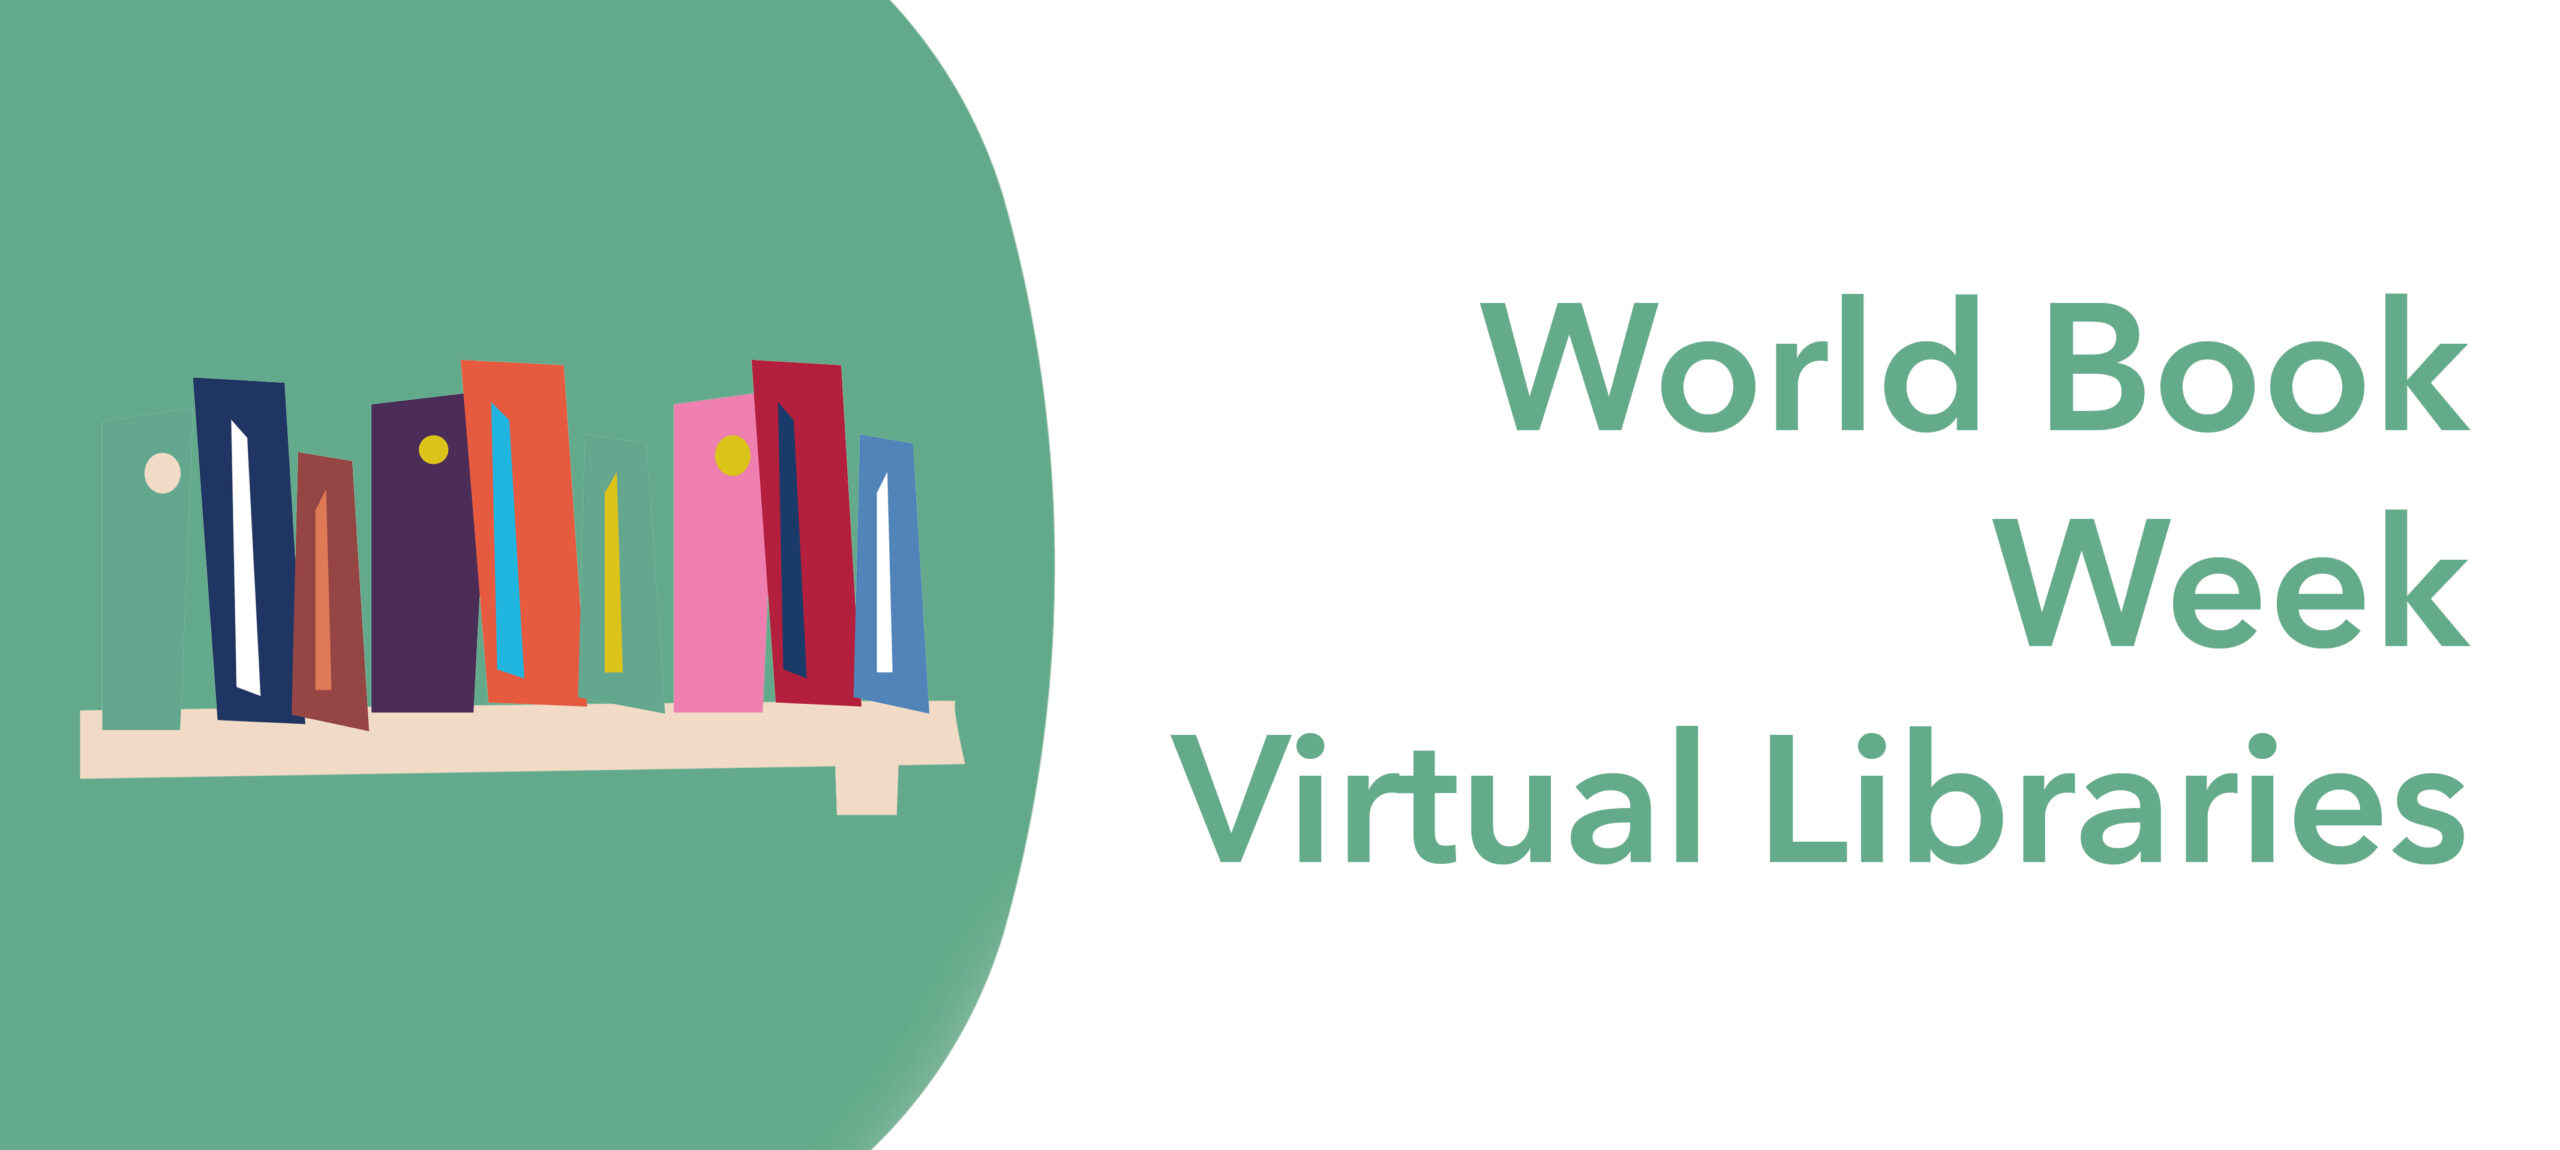 World Book Week Virtual Libraries!